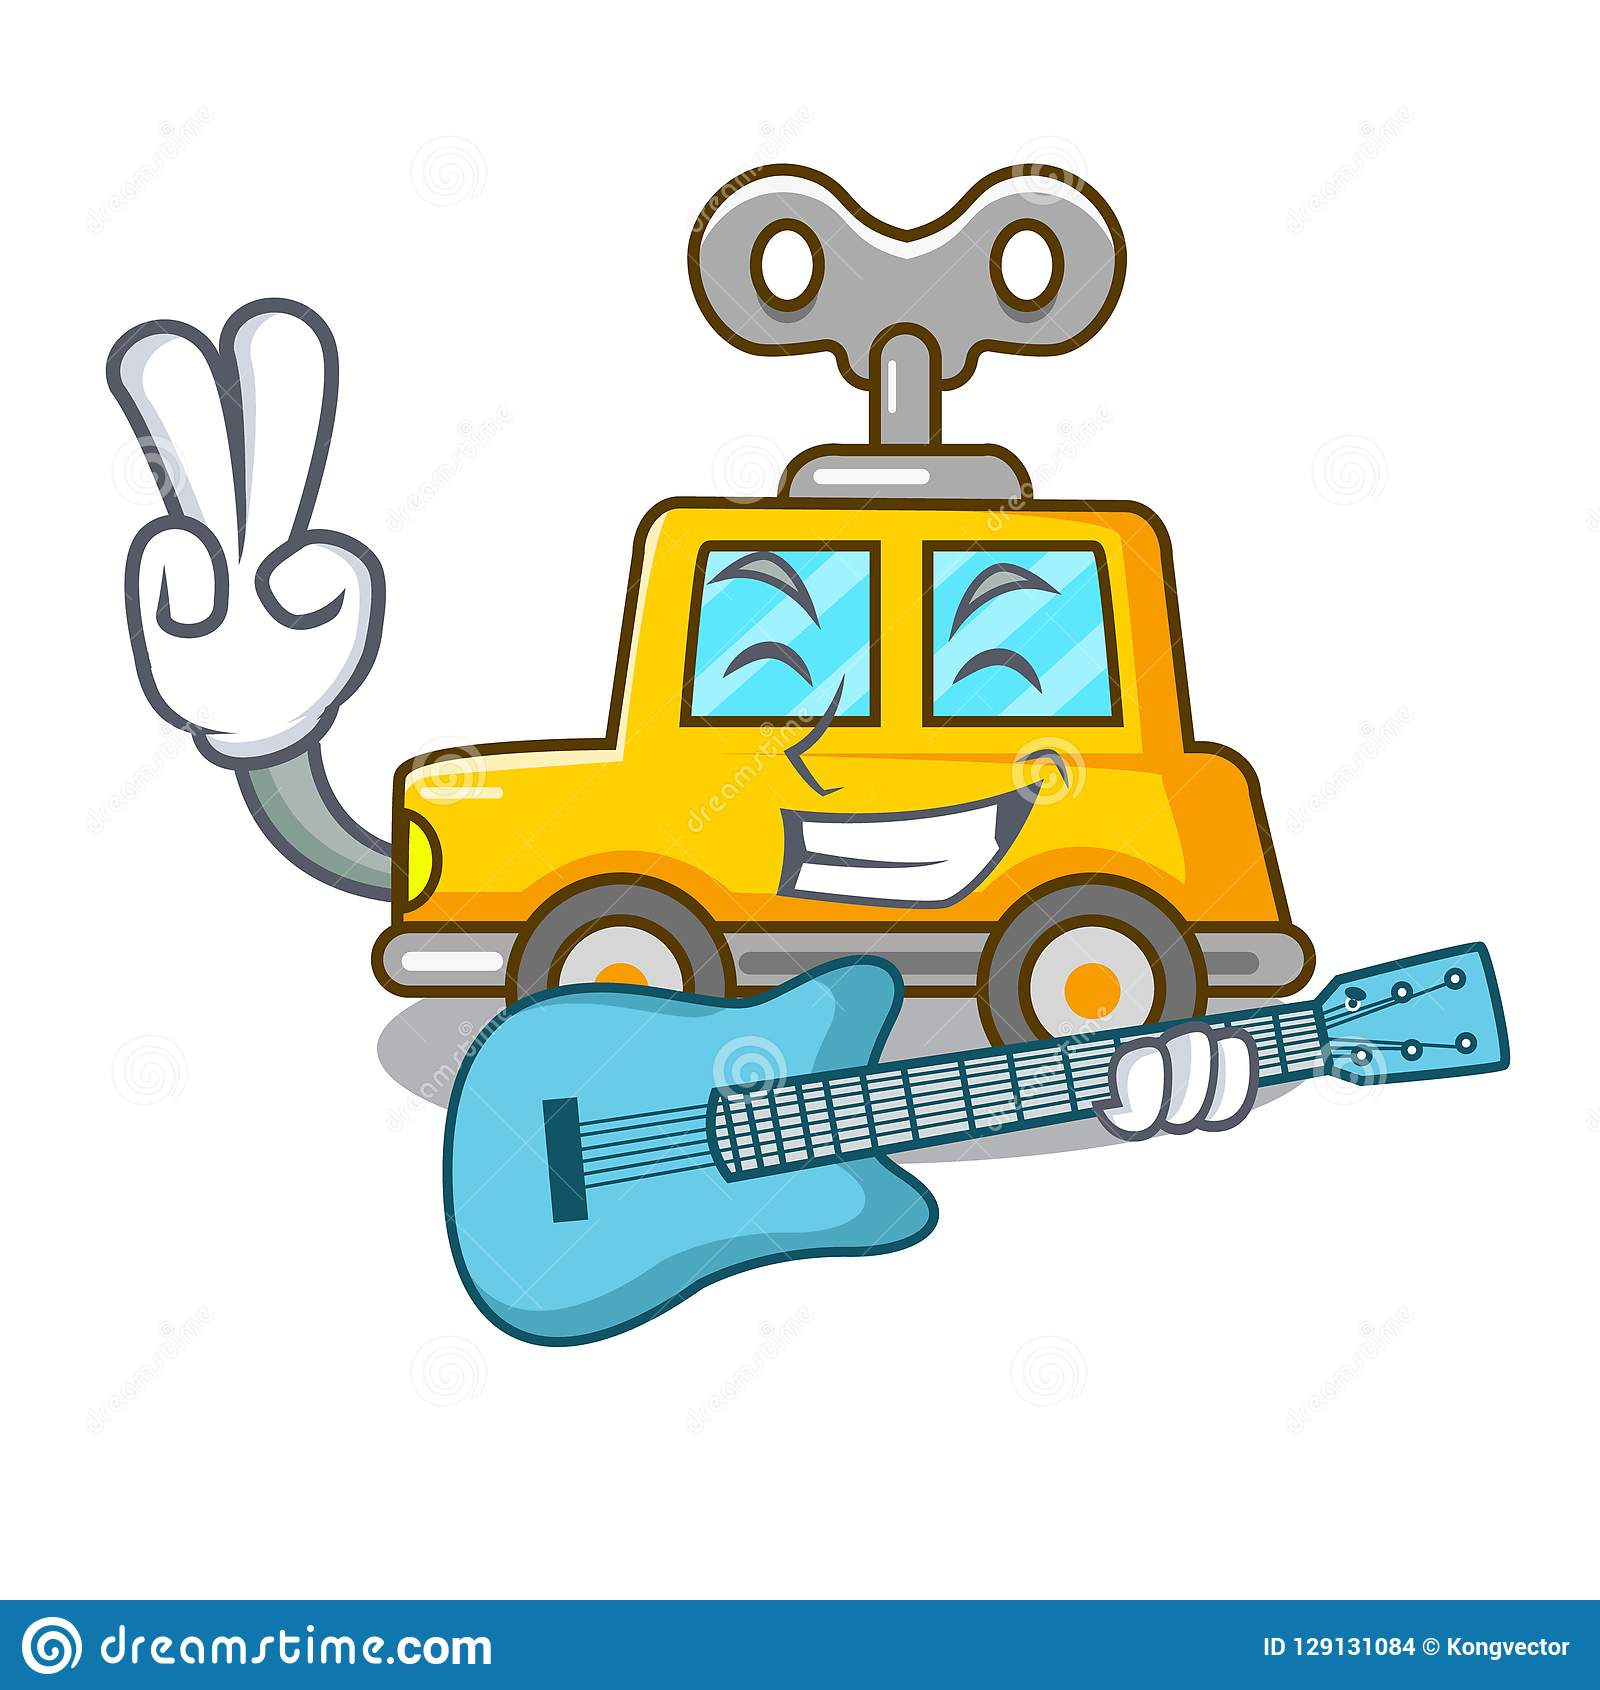 Historieta El Del Mecánico Juguete Con Coche Guitarra La De shdrtQ